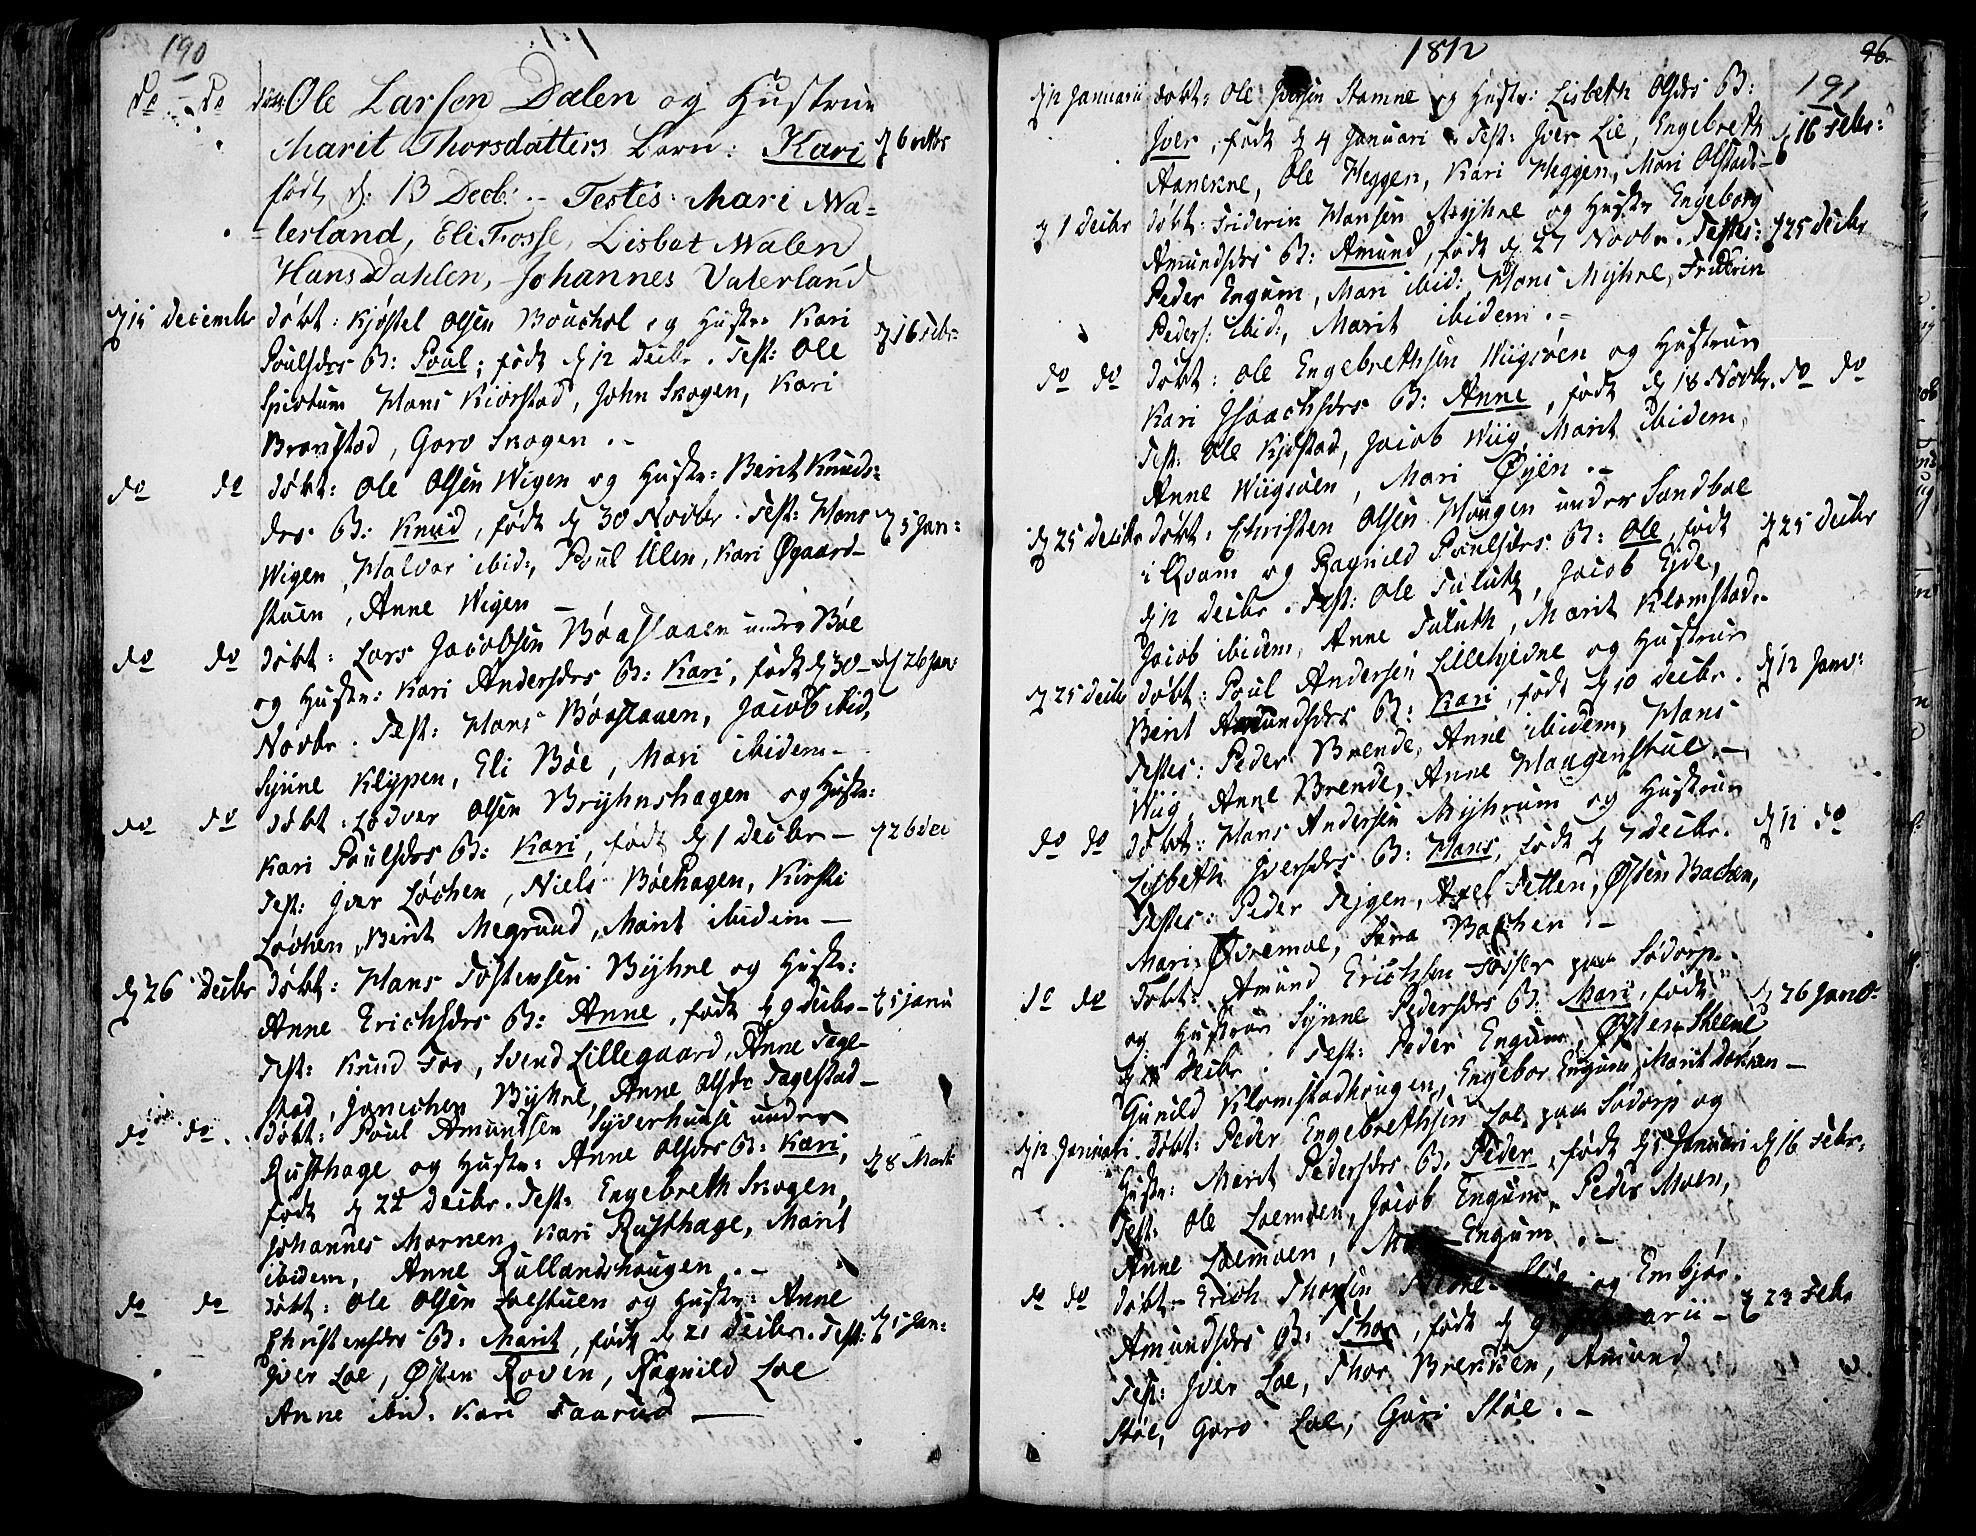 SAH, Fron prestekontor, H/Ha/Haa/L0001: Ministerialbok nr. 1, 1799-1816, s. 190-191